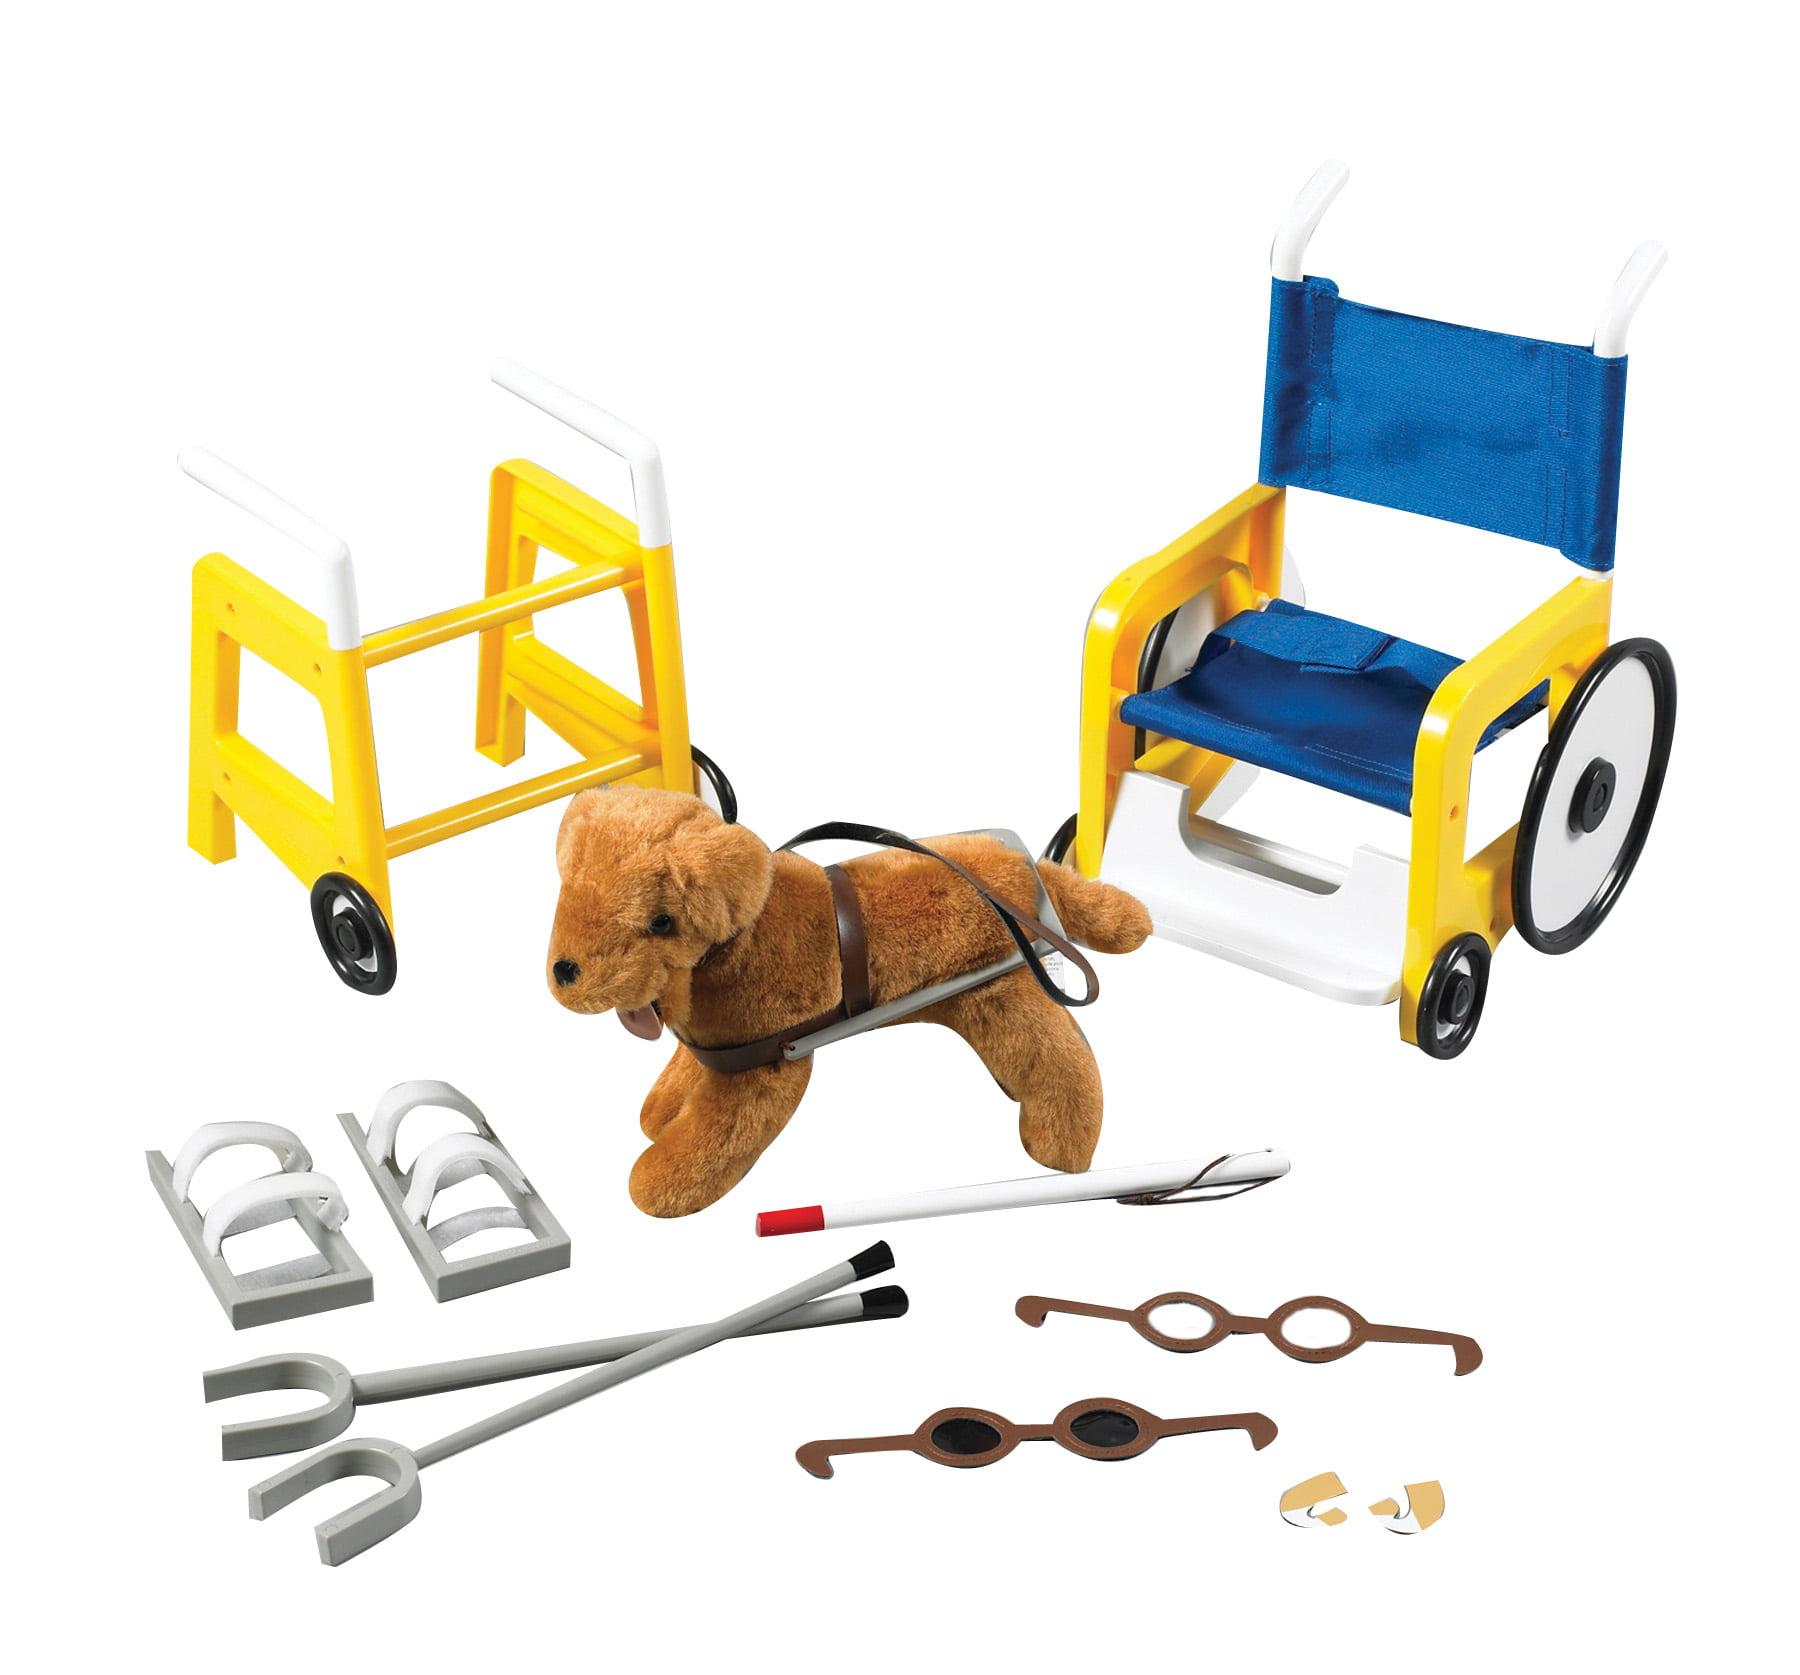 CHILDREN'S FACTORY Special Needs Equipment for Sweat Suit...